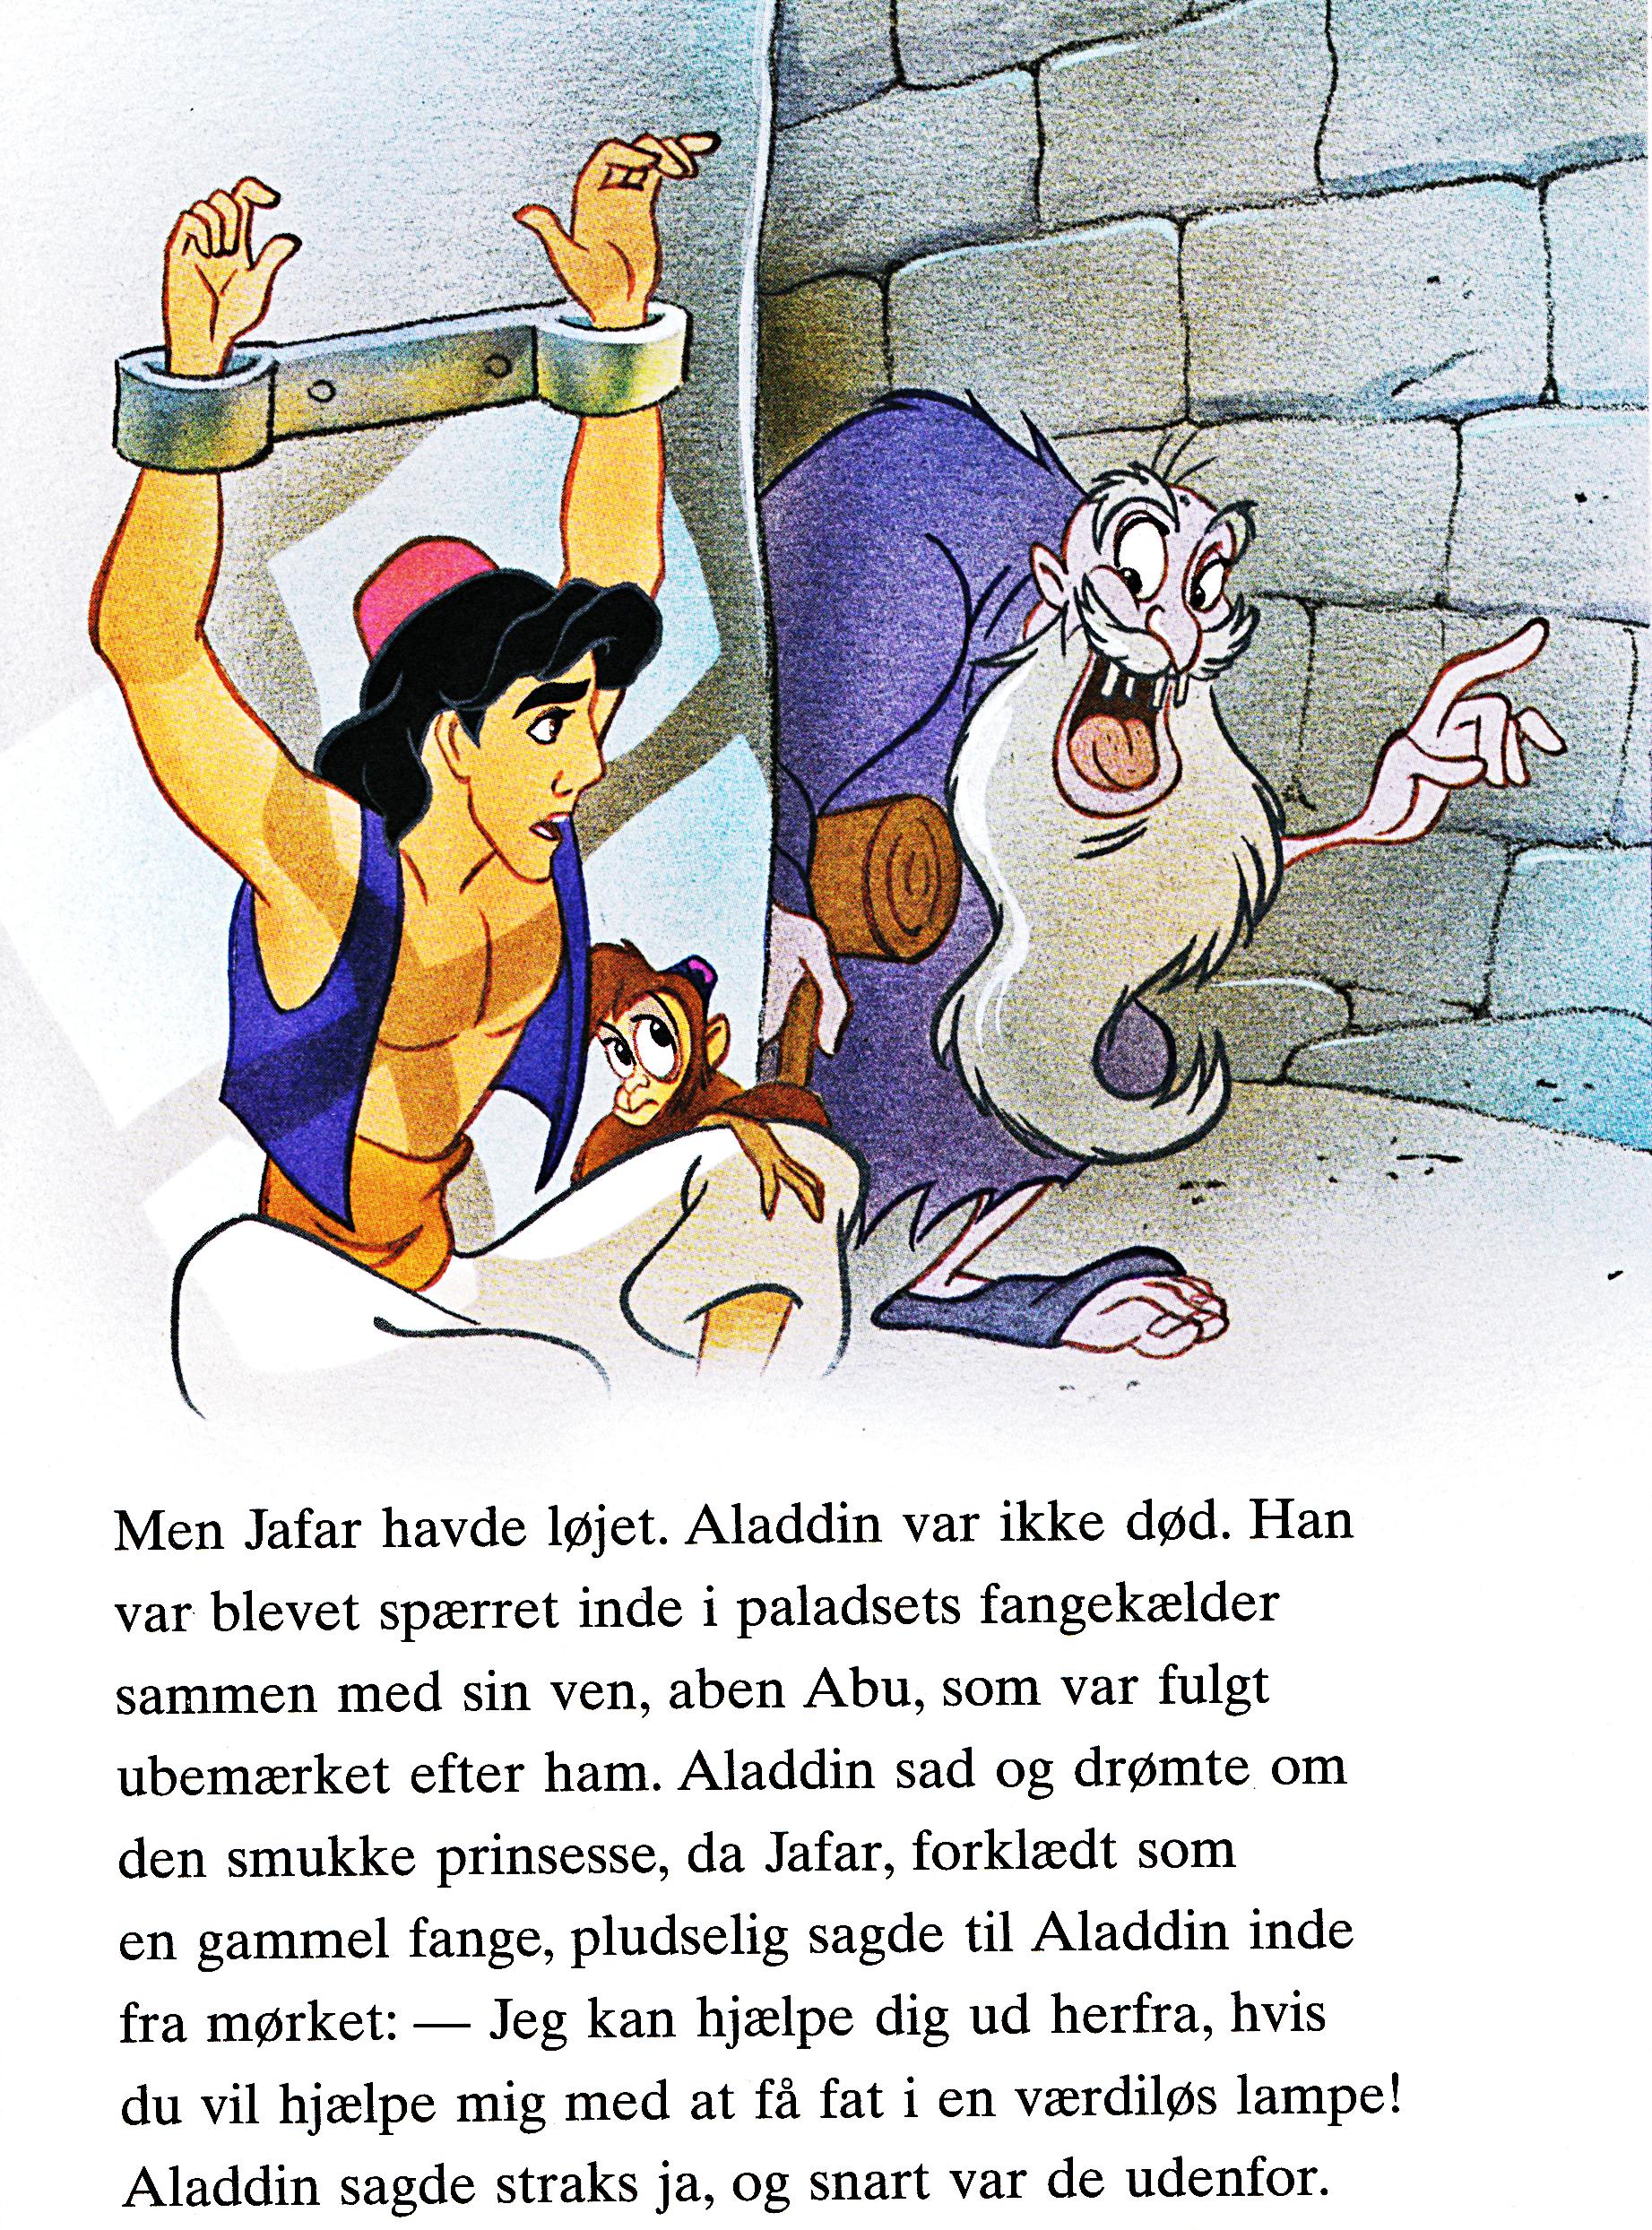 Walt disney Book imágenes - Prince Aladdin, Abu & Jafar